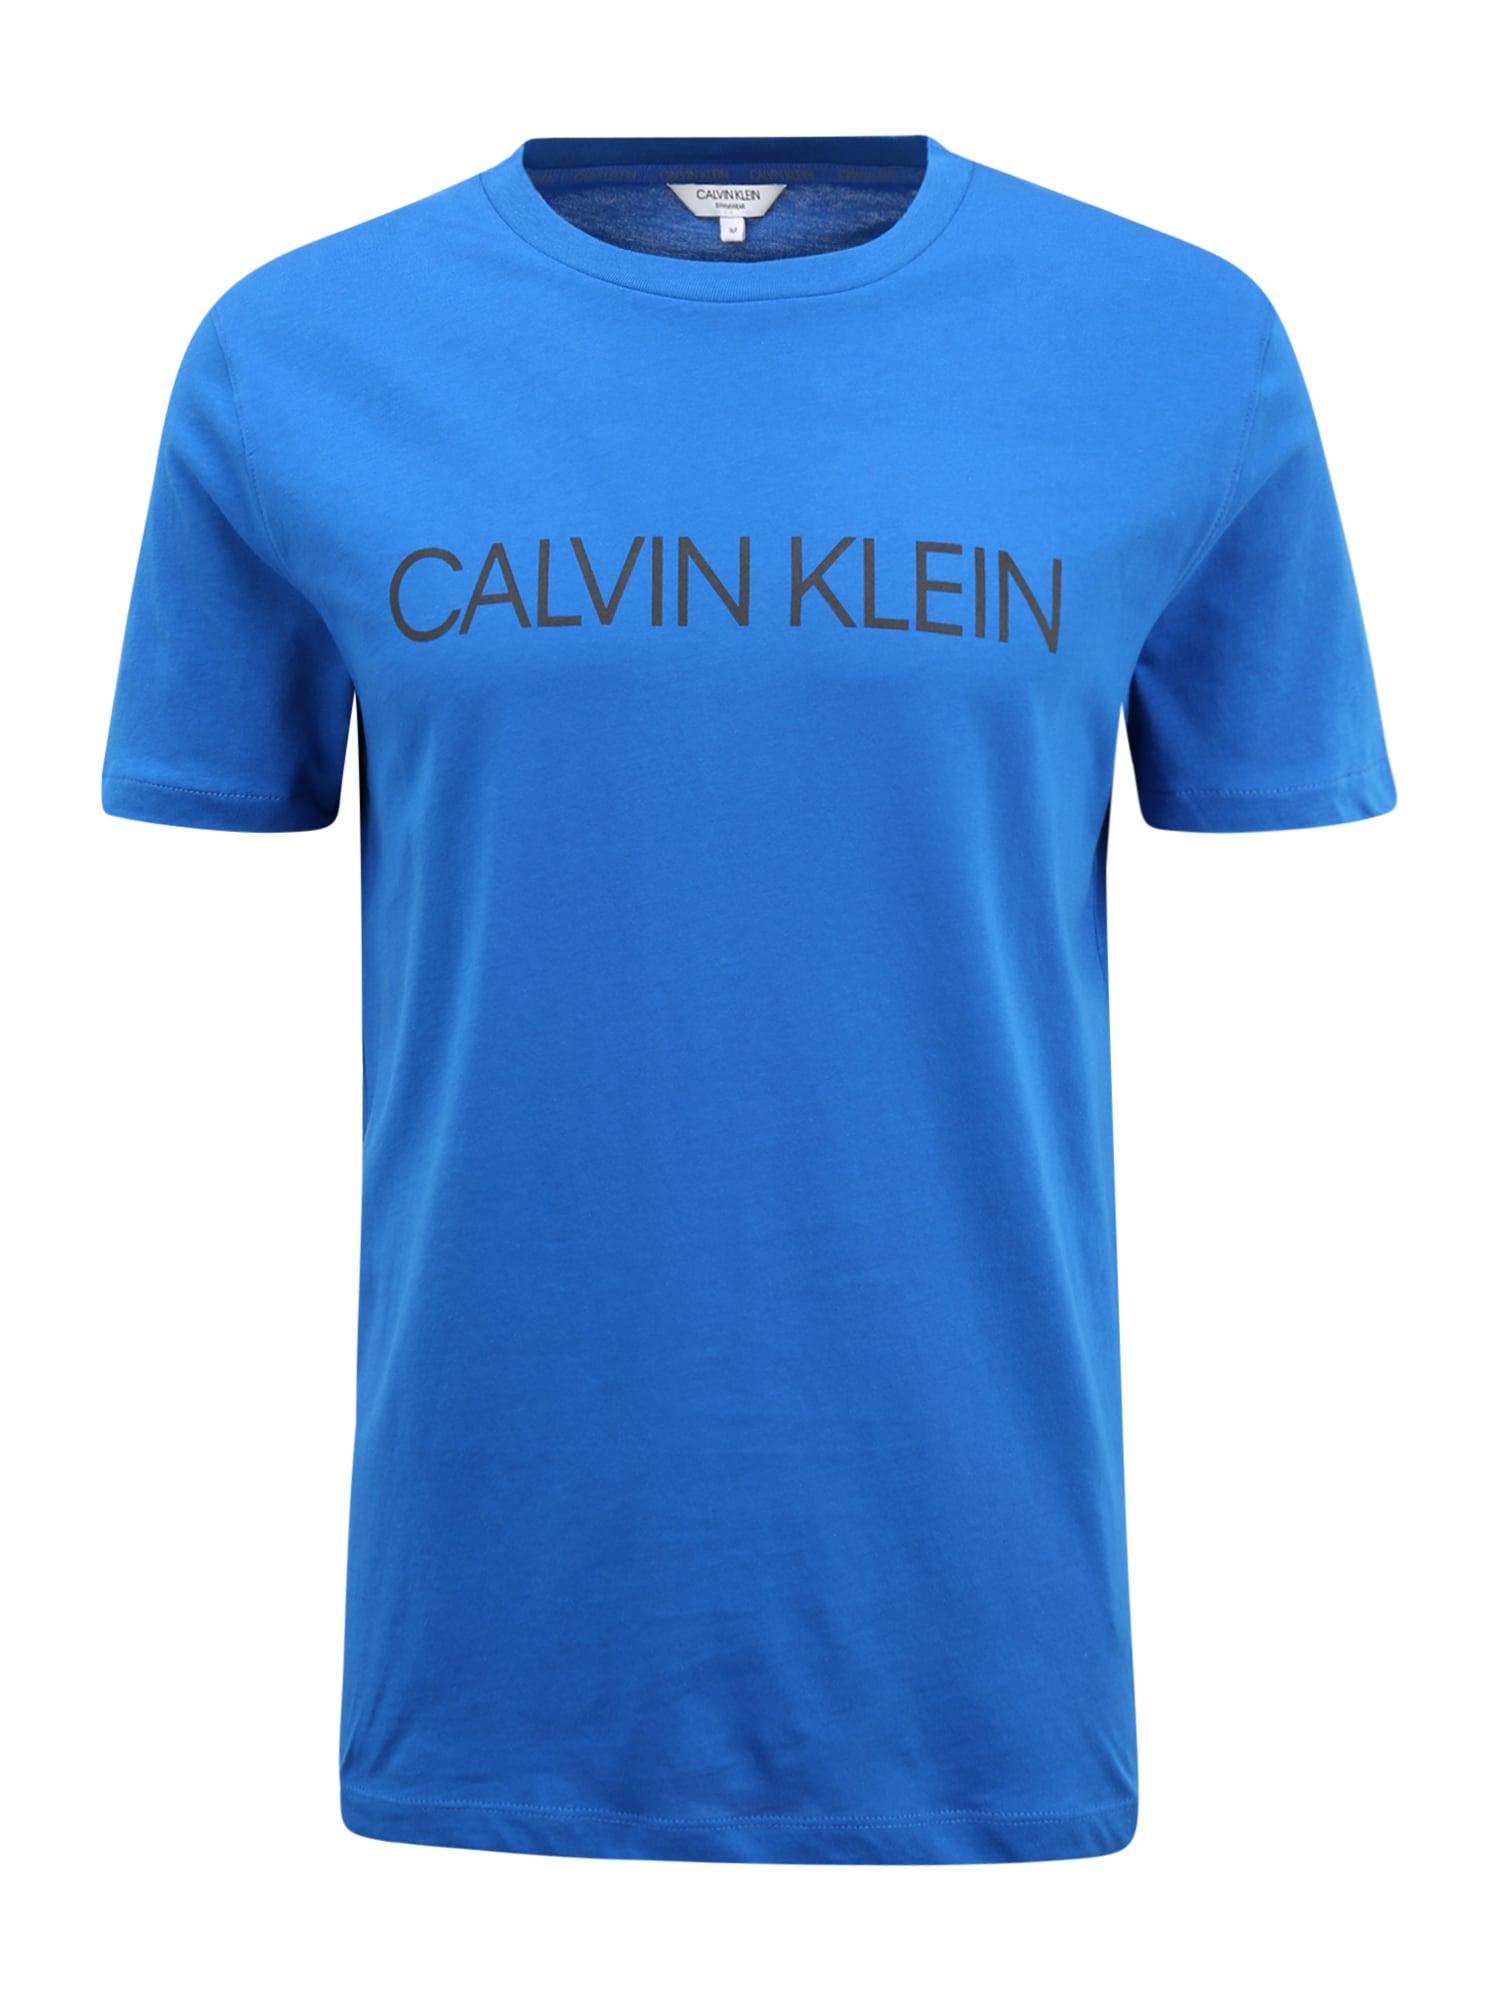 "Calvin Klein Swimwear Marškinėliai juoda / sodri mėlyna (""karališka"")"